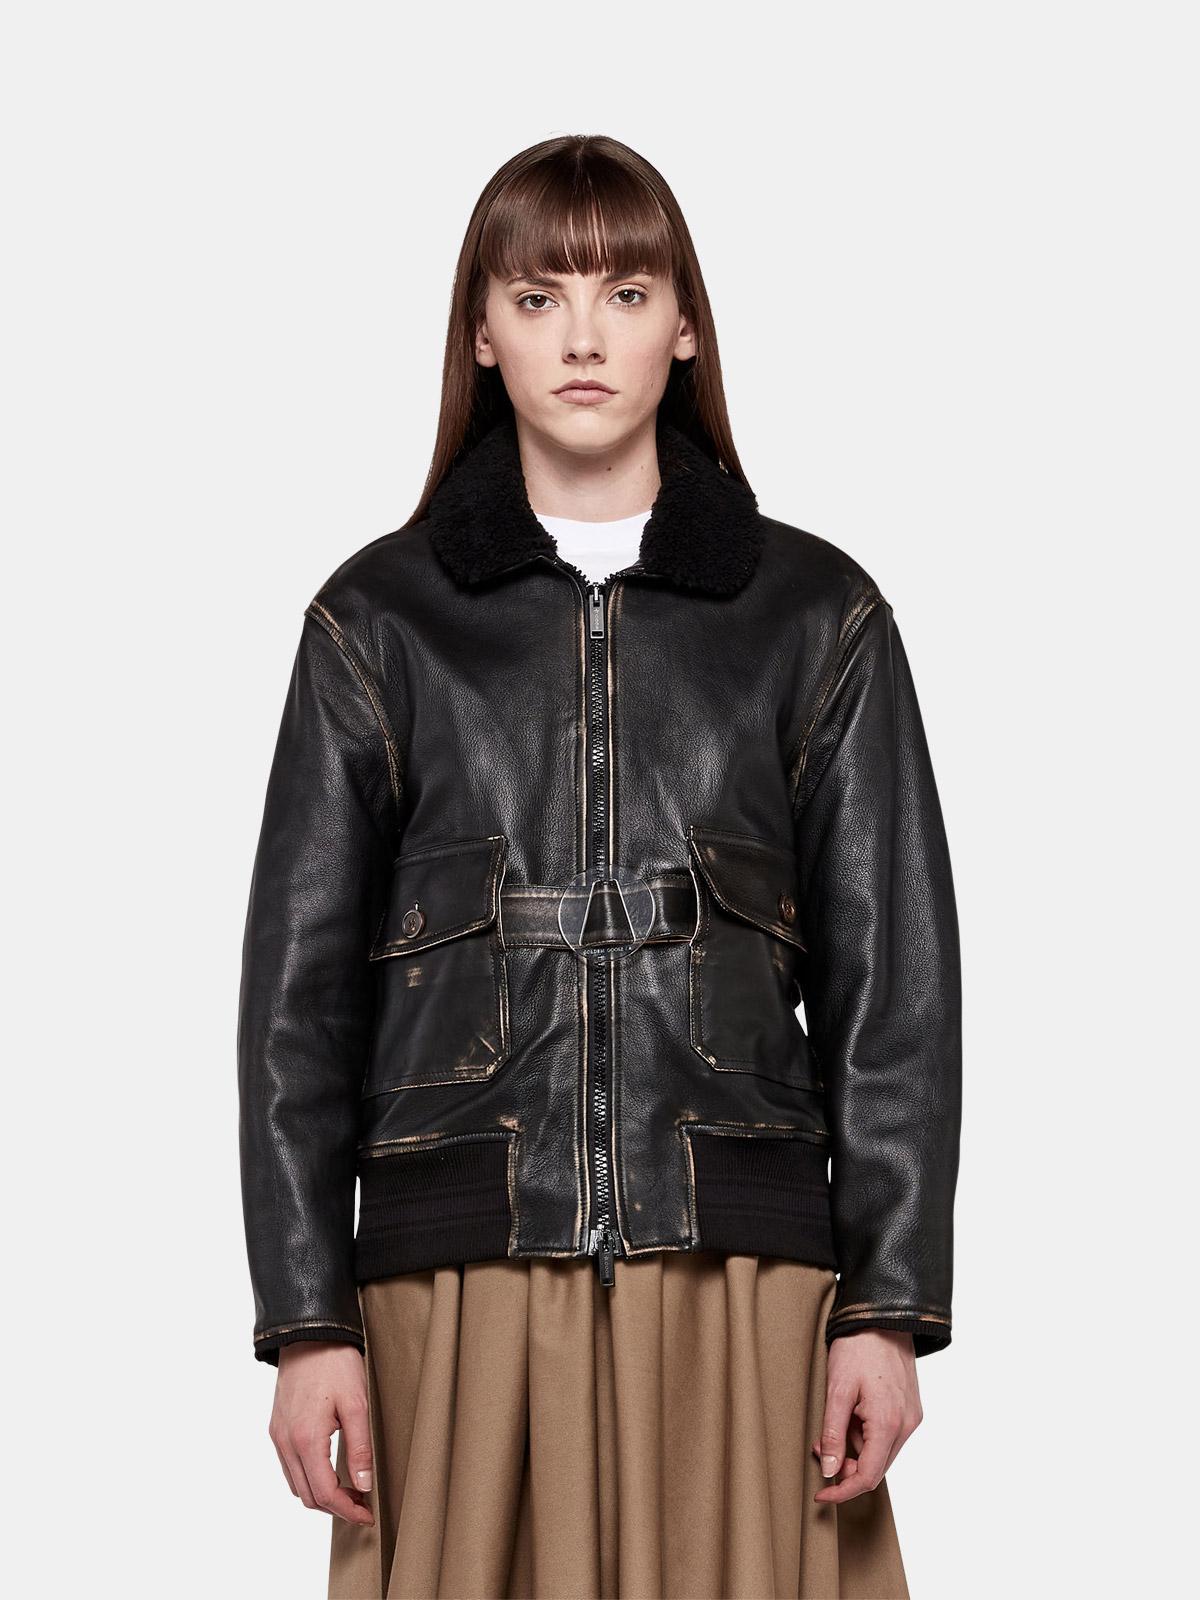 Golden Goose - Erika bomber jacket in vintage-look nappa leather in